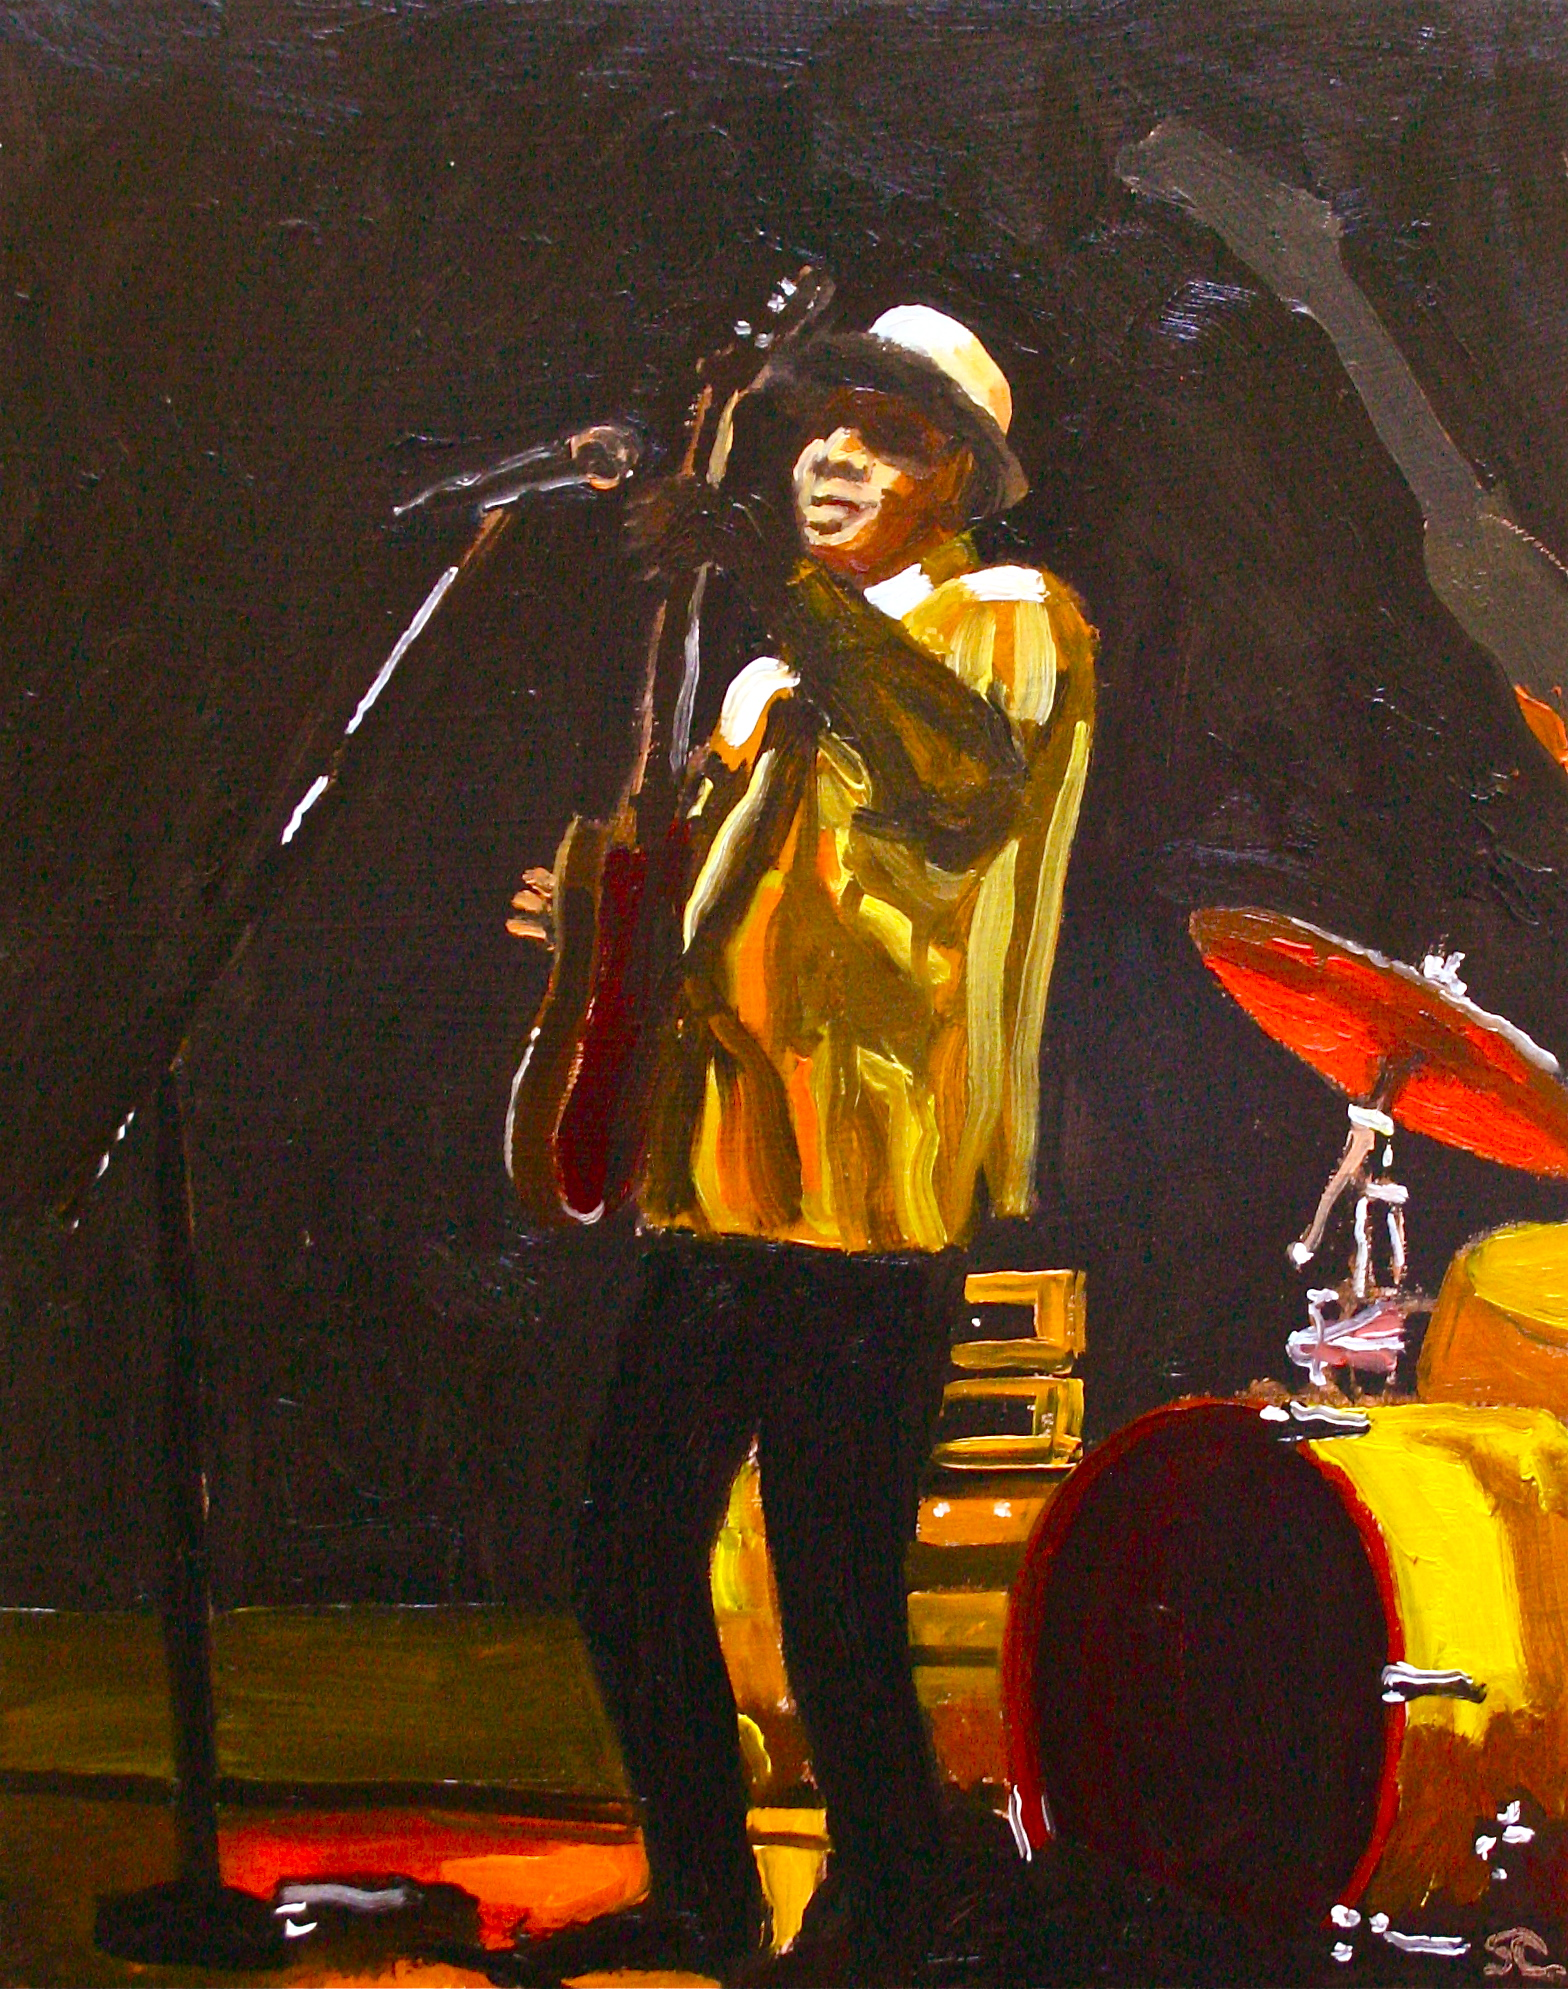 """Hey Mister Bluesman"" oil on panel 8 x 10, sold"